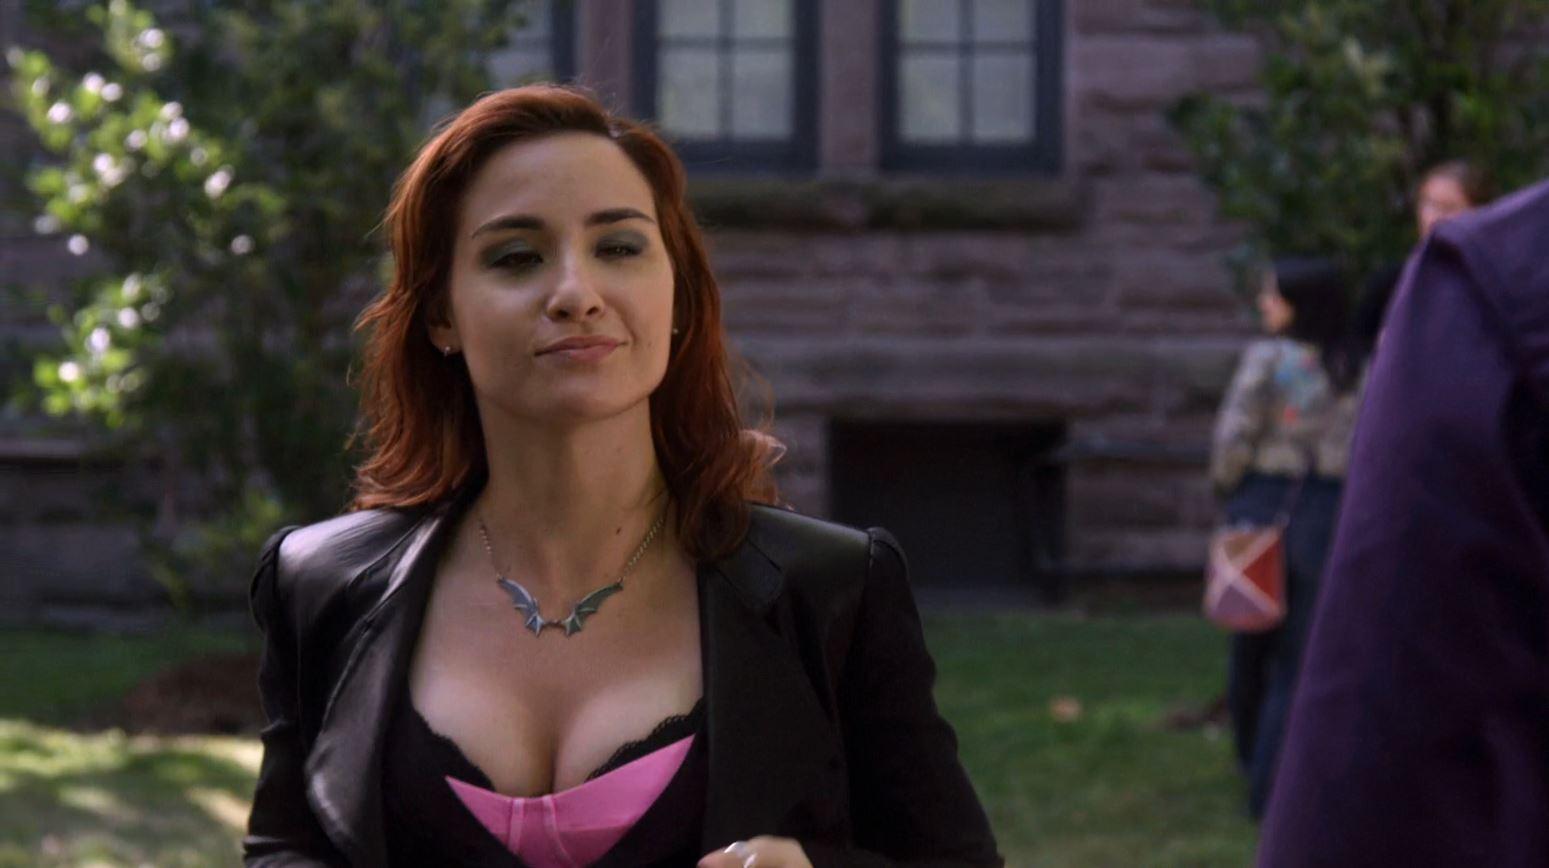 Warehouse 13 Savage Seduction - Allison Scagliotti breasts (Twin Peaks)